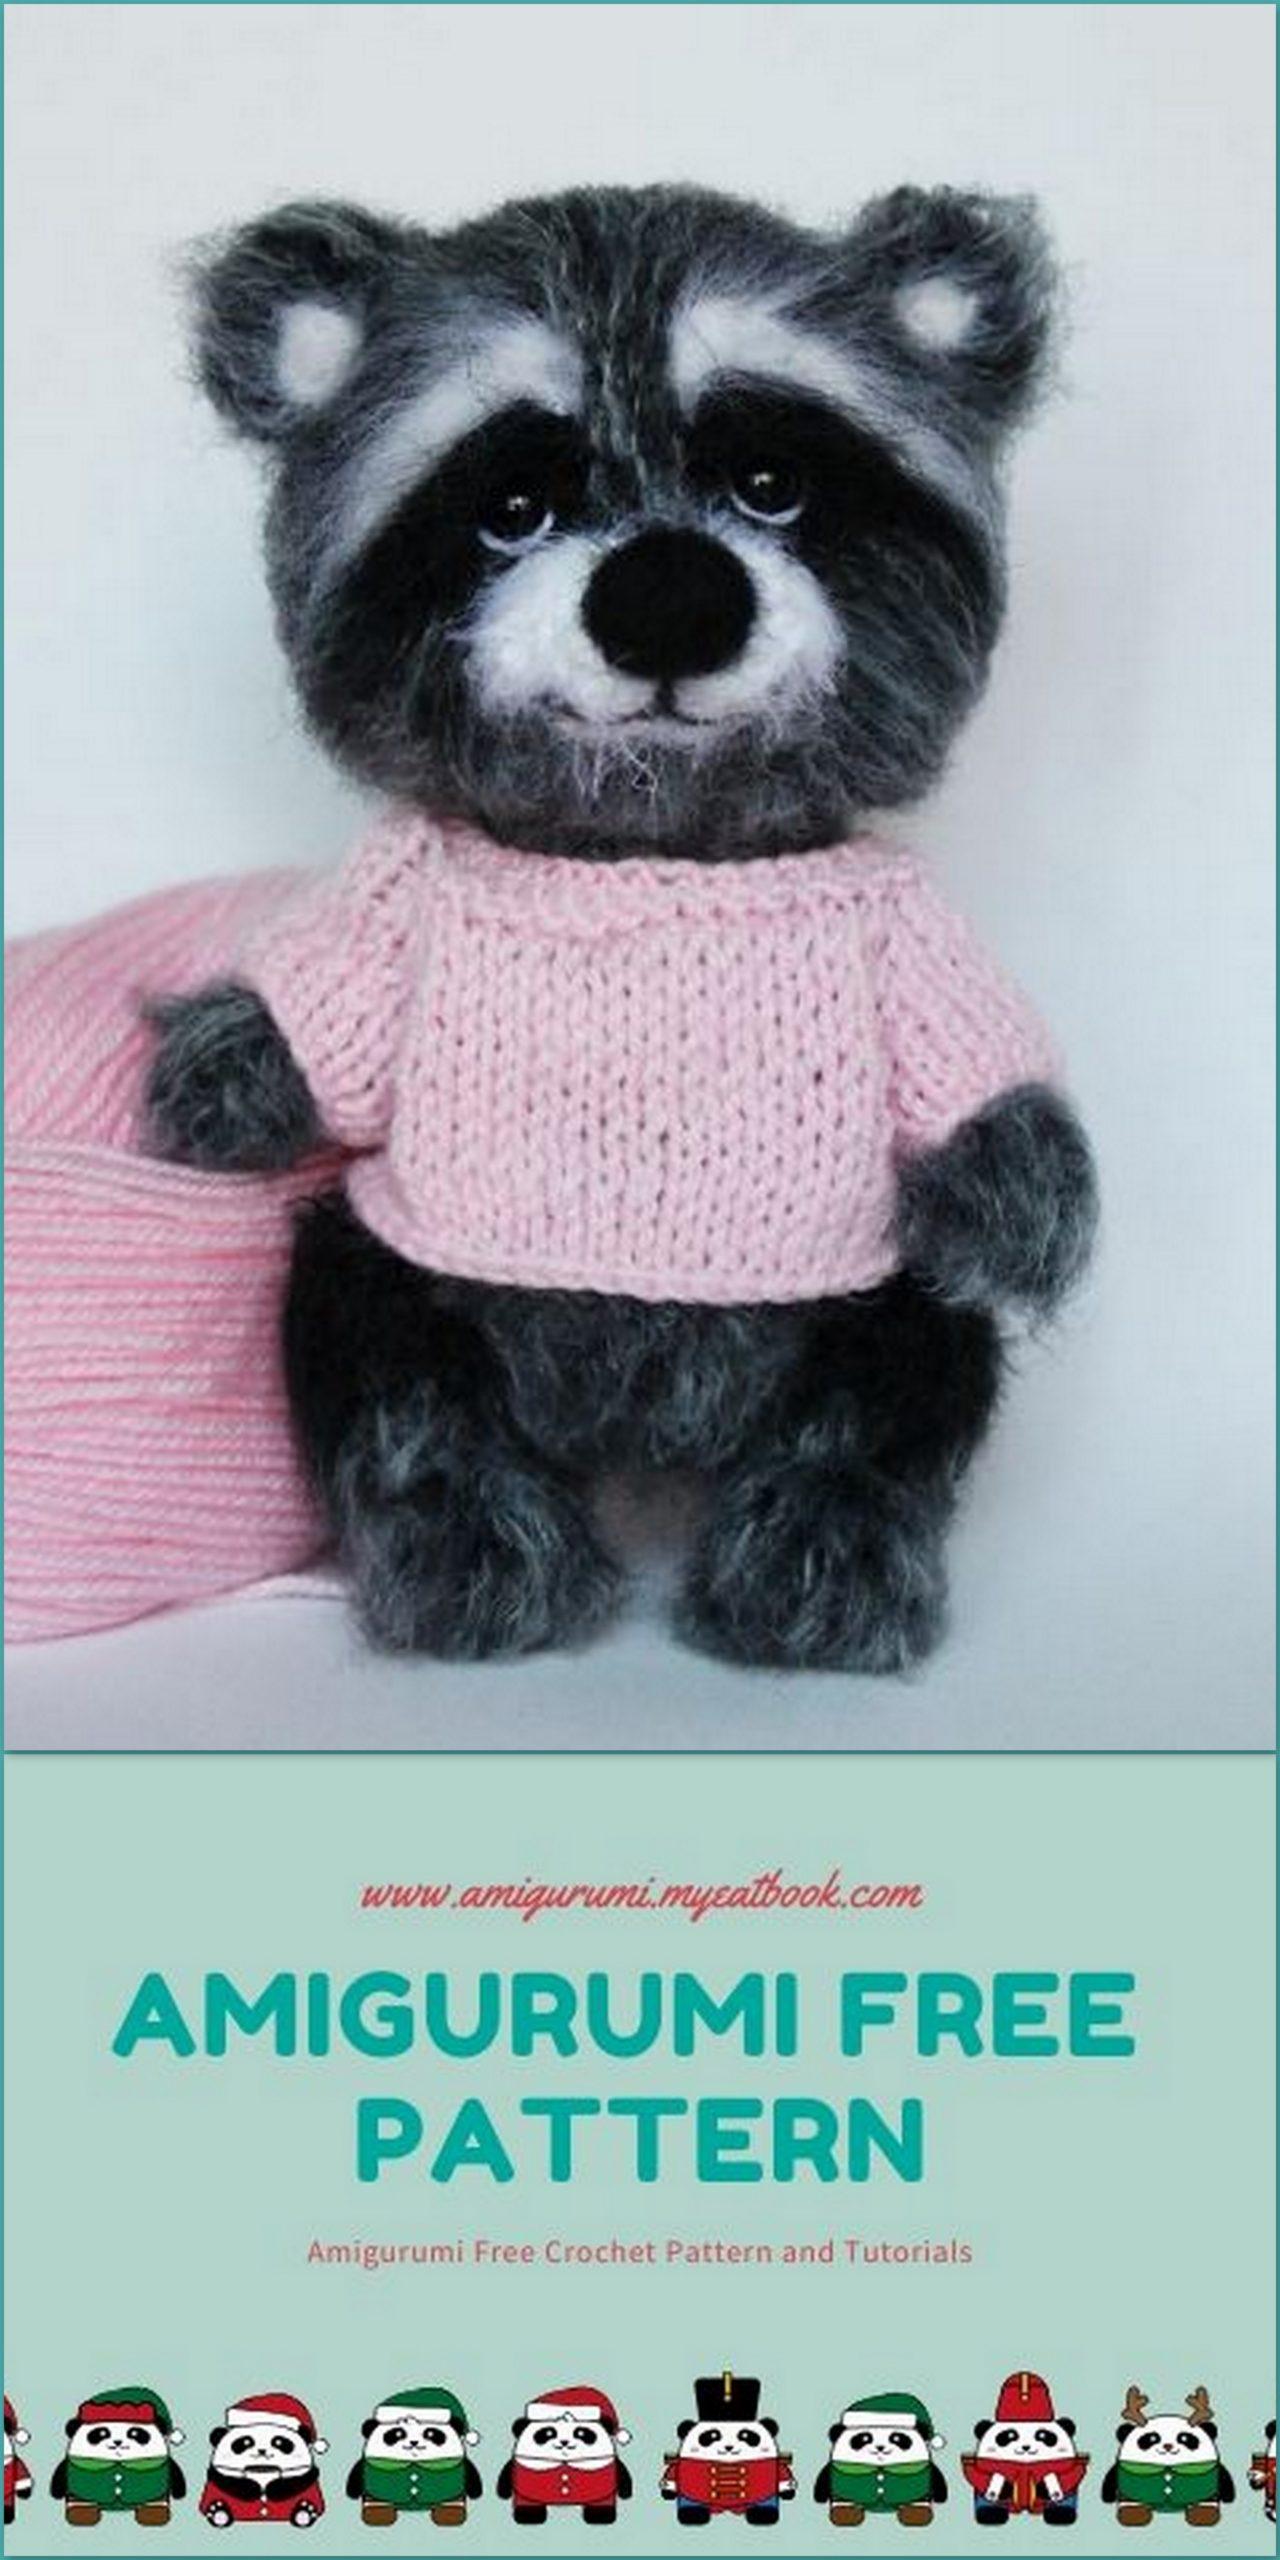 Raccoon Amigurumi Free Crochet Pattern | 2560x1280